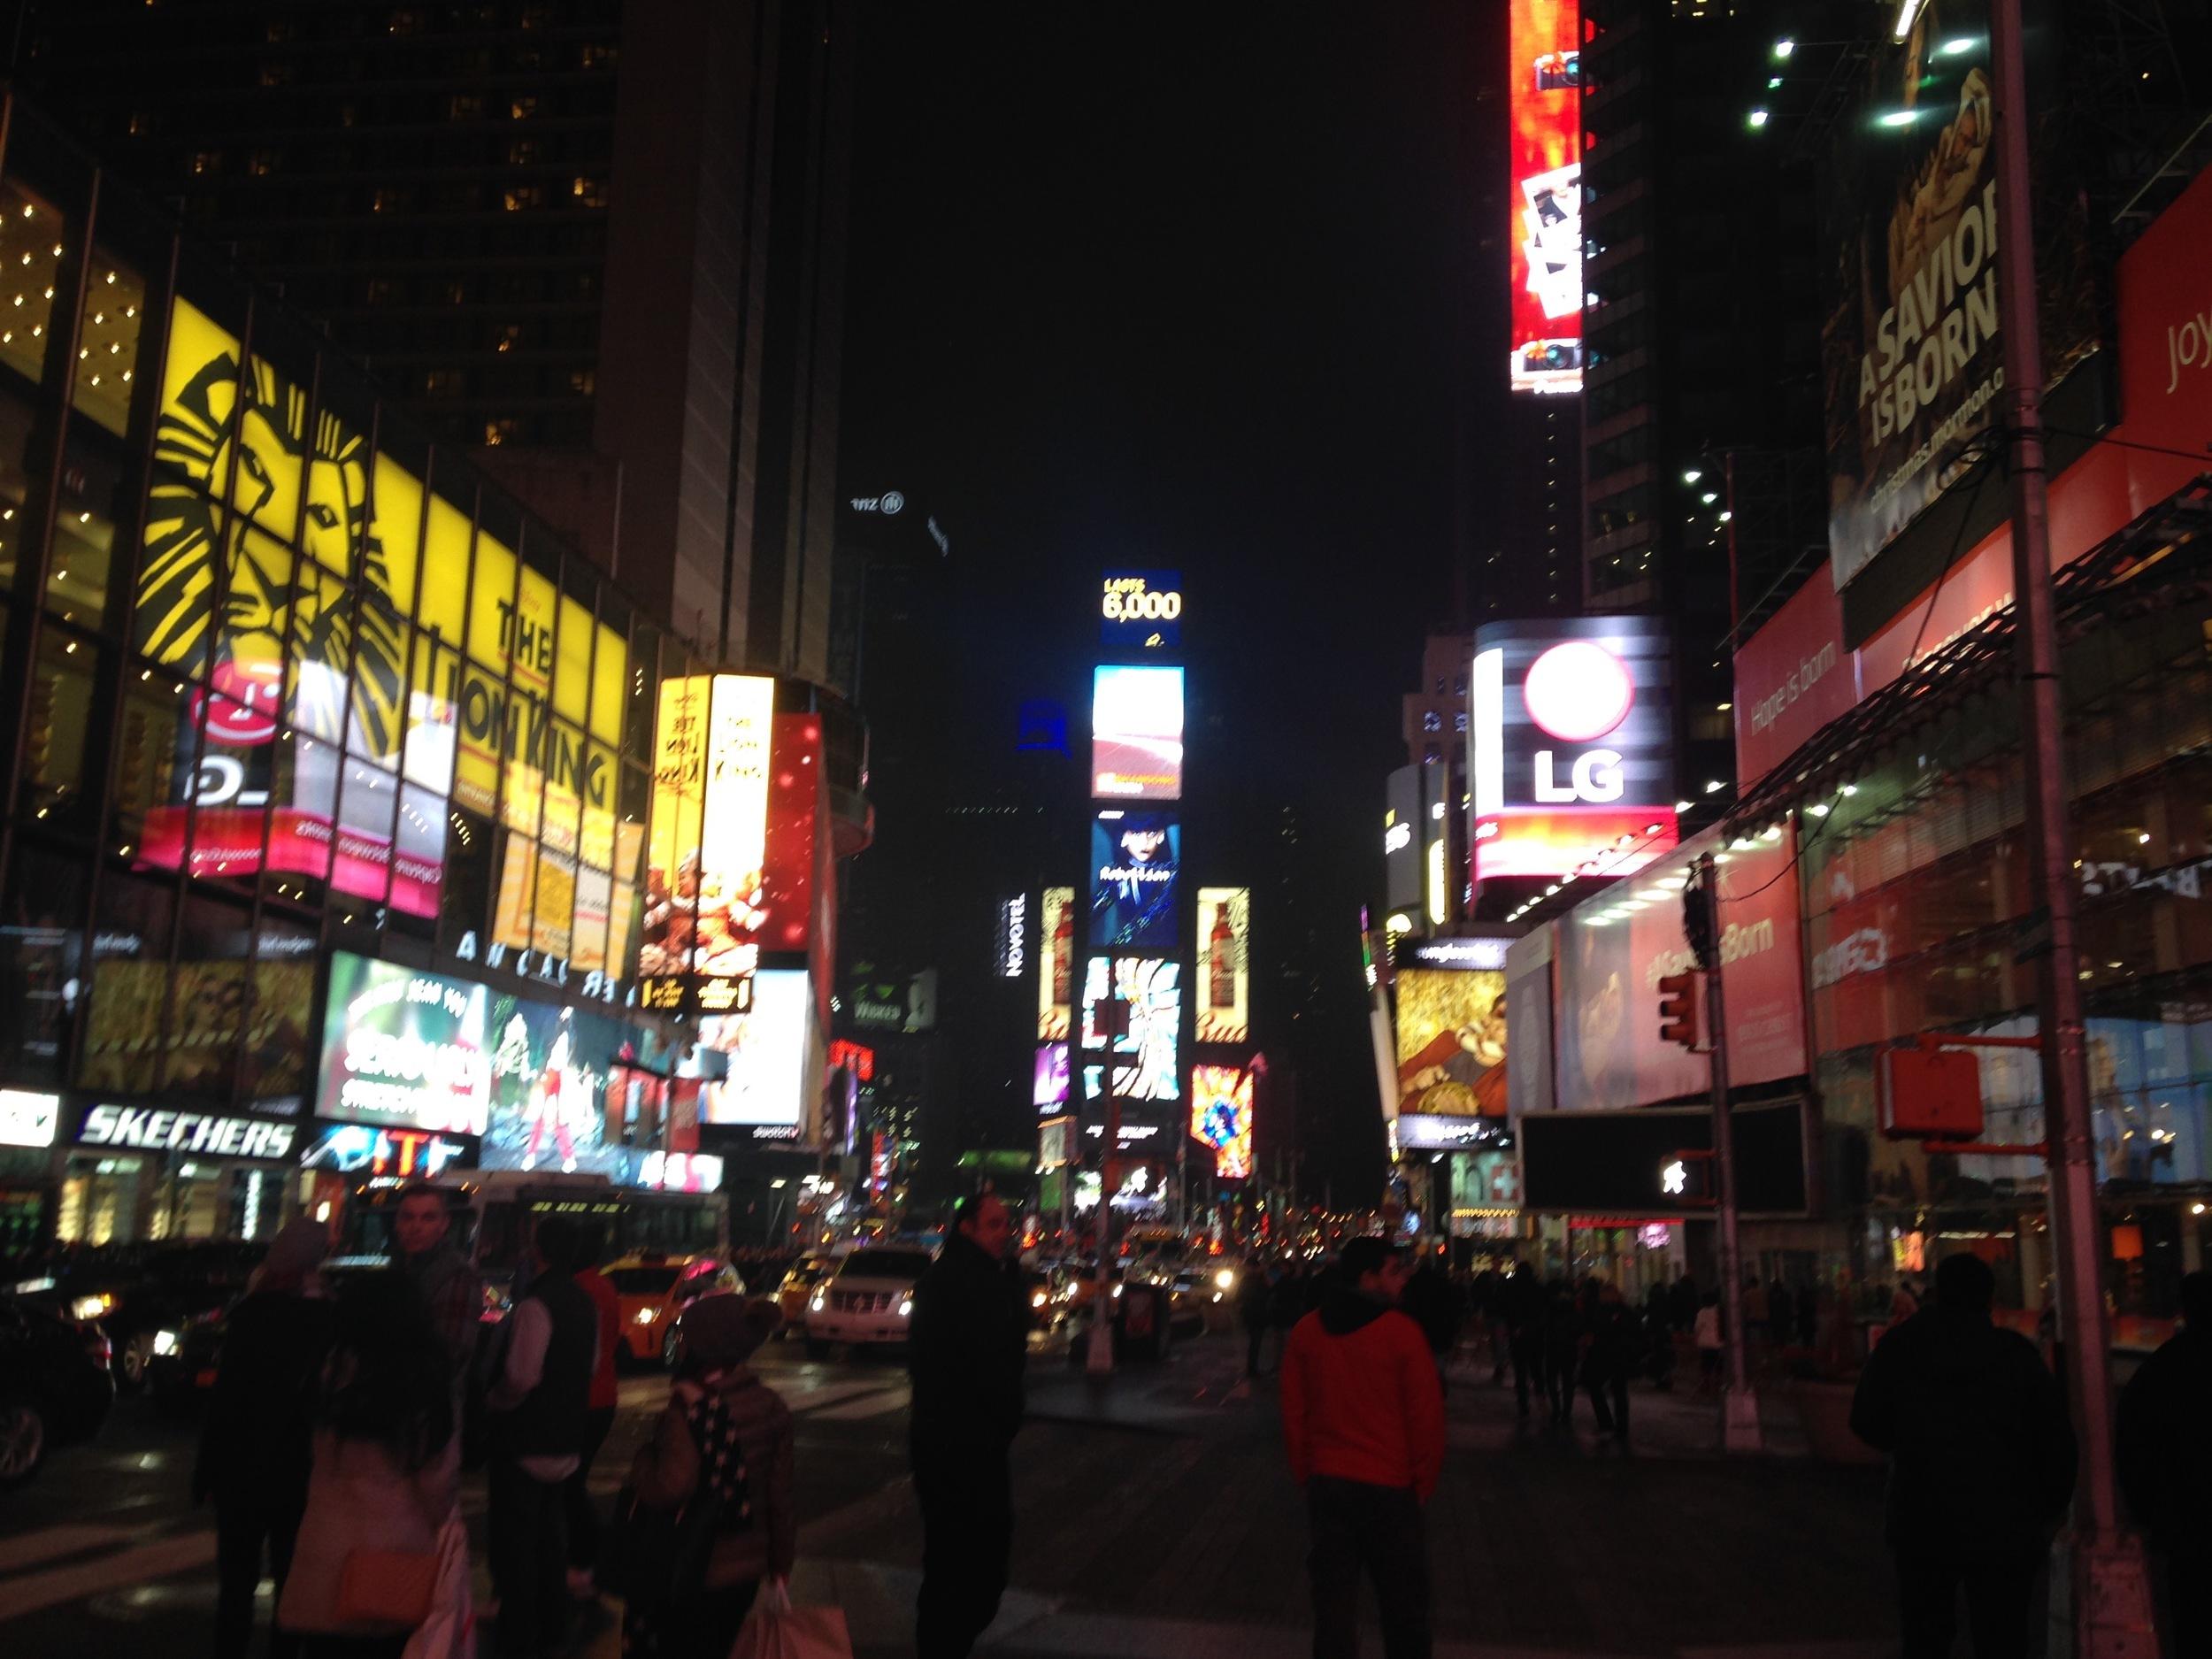 NEW YORK CITY: INSPIRATION IN DIVERSITY (NEW YORK)